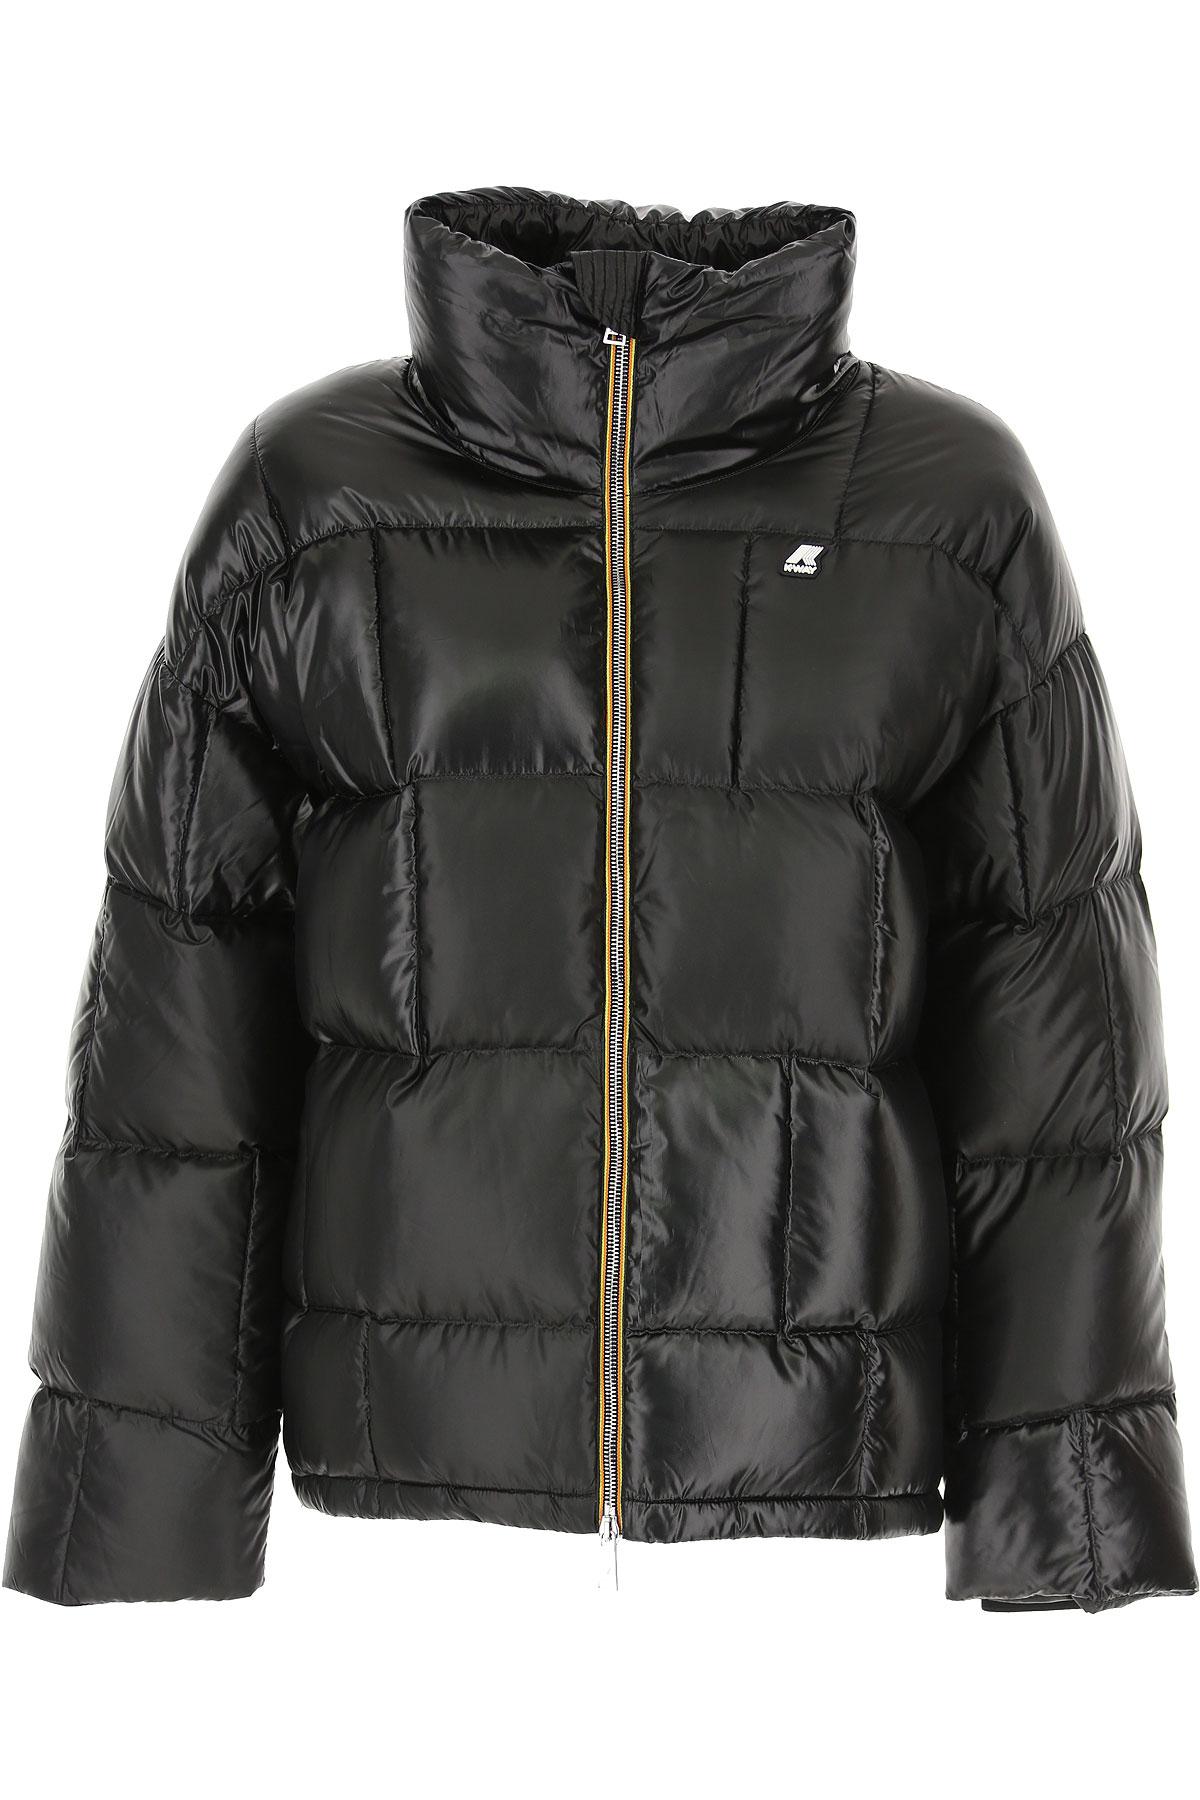 K-Way Down Jacket for Women, Puffer Ski Jacket On Sale, Black, polyestere, 2019, 40 44